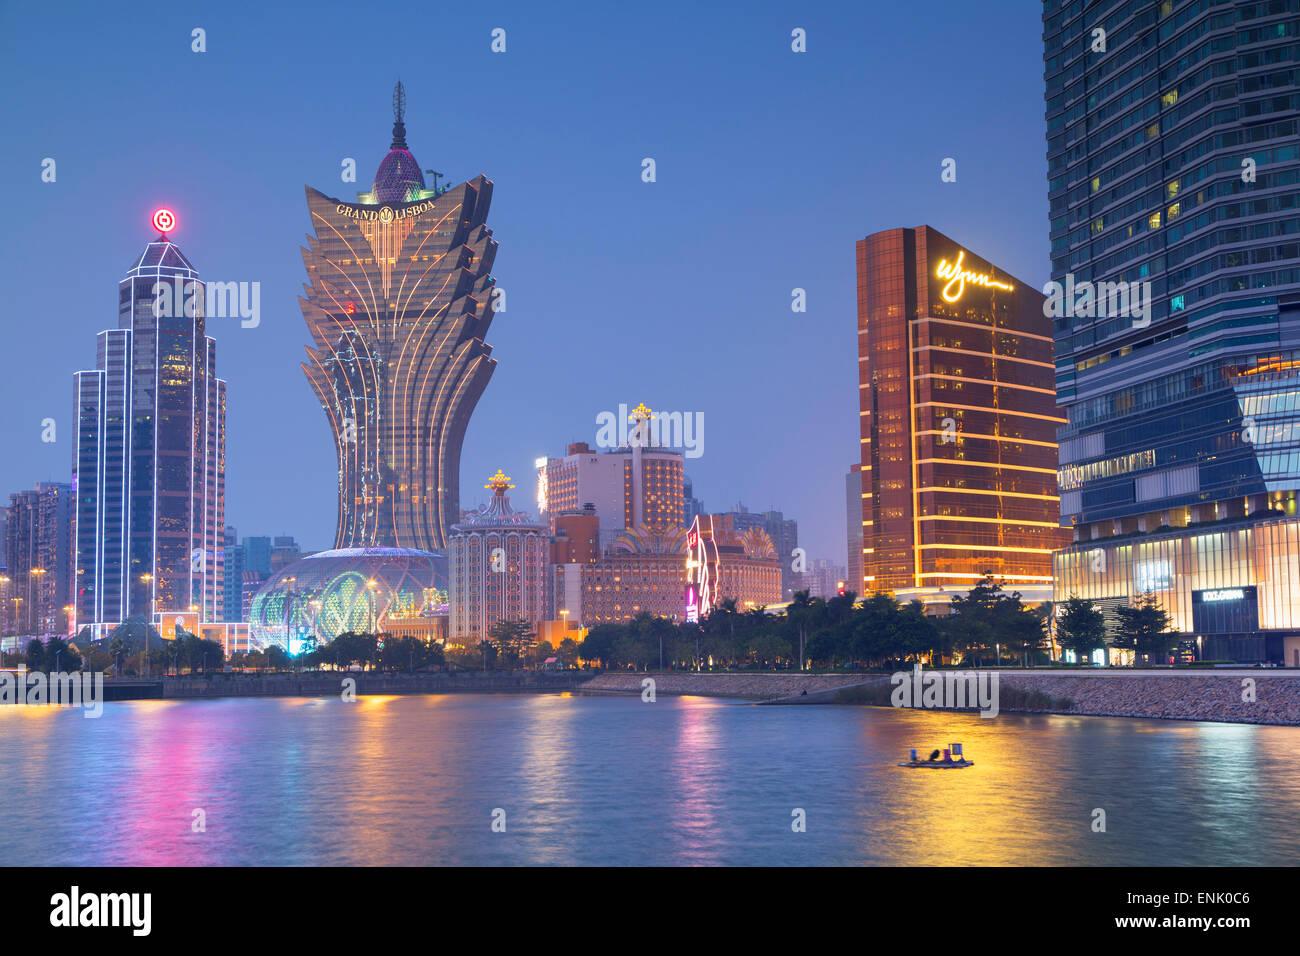 Grand Lisboa y Wynn Hotel and Casino al anochecer, Macao, China, Asia Imagen De Stock